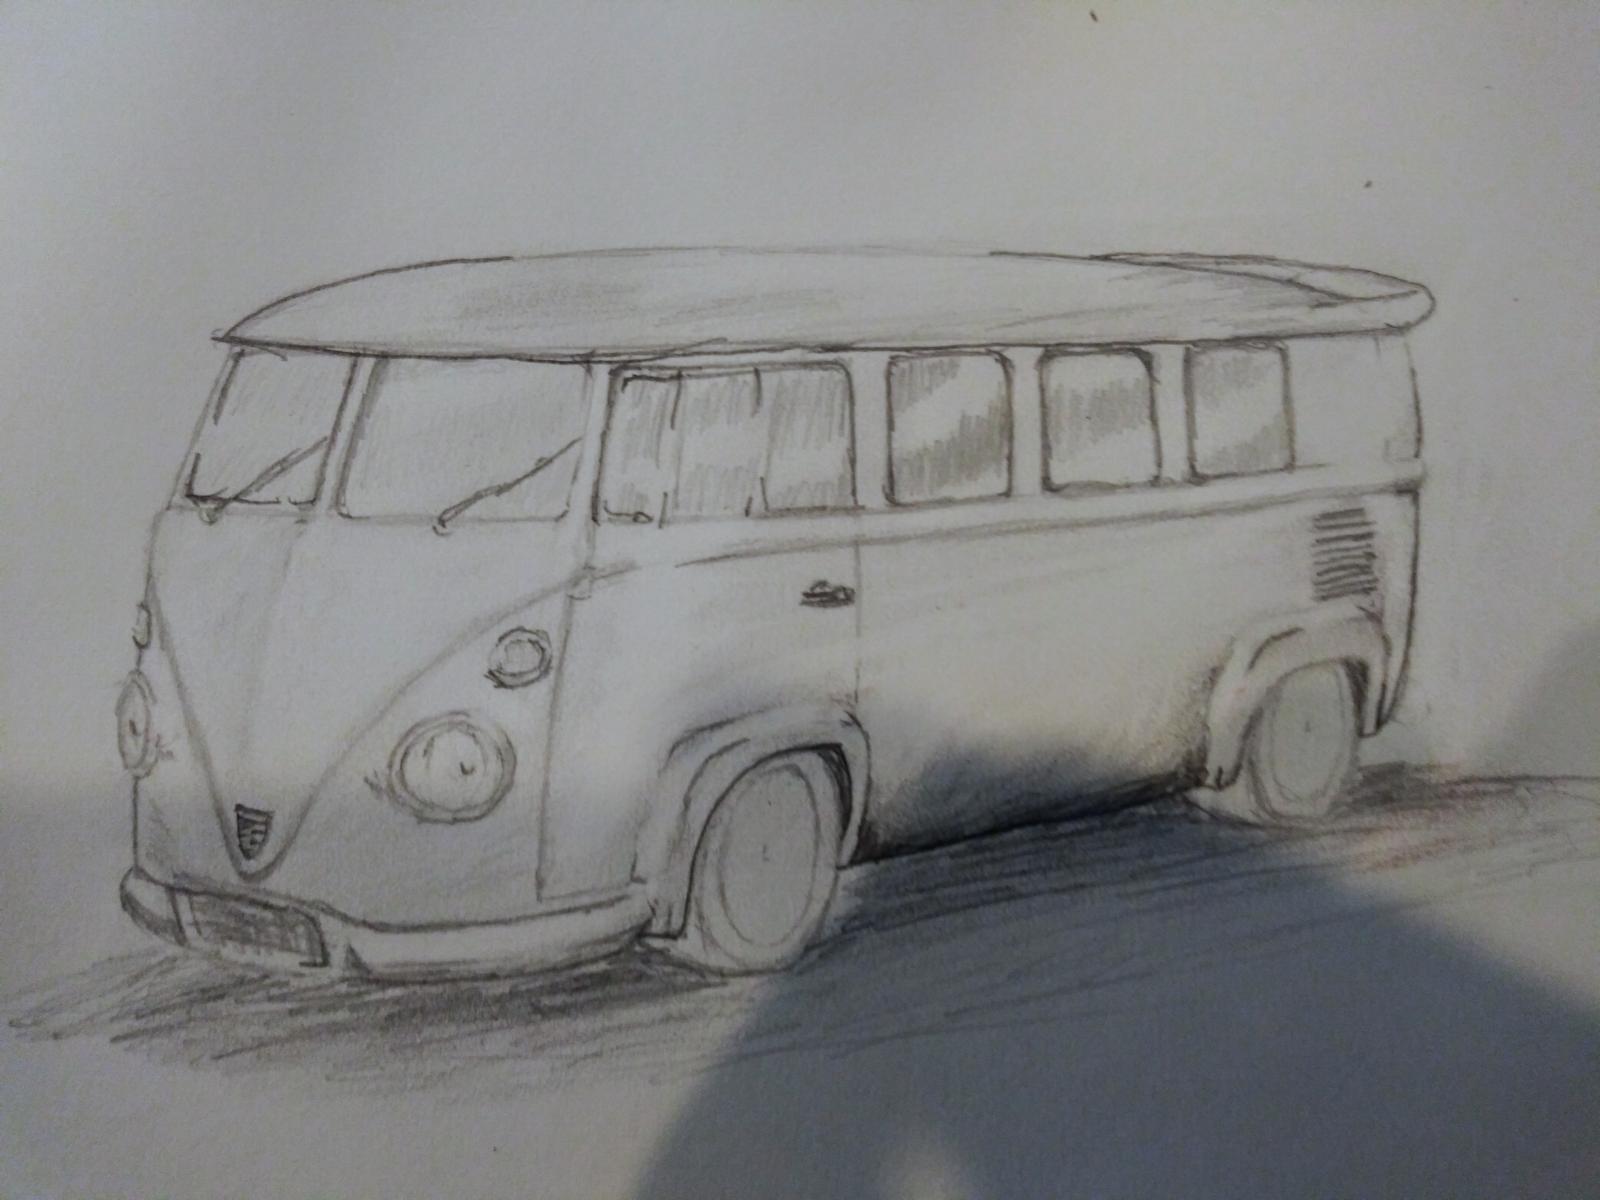 Quik sketch of ideas for the honda bus